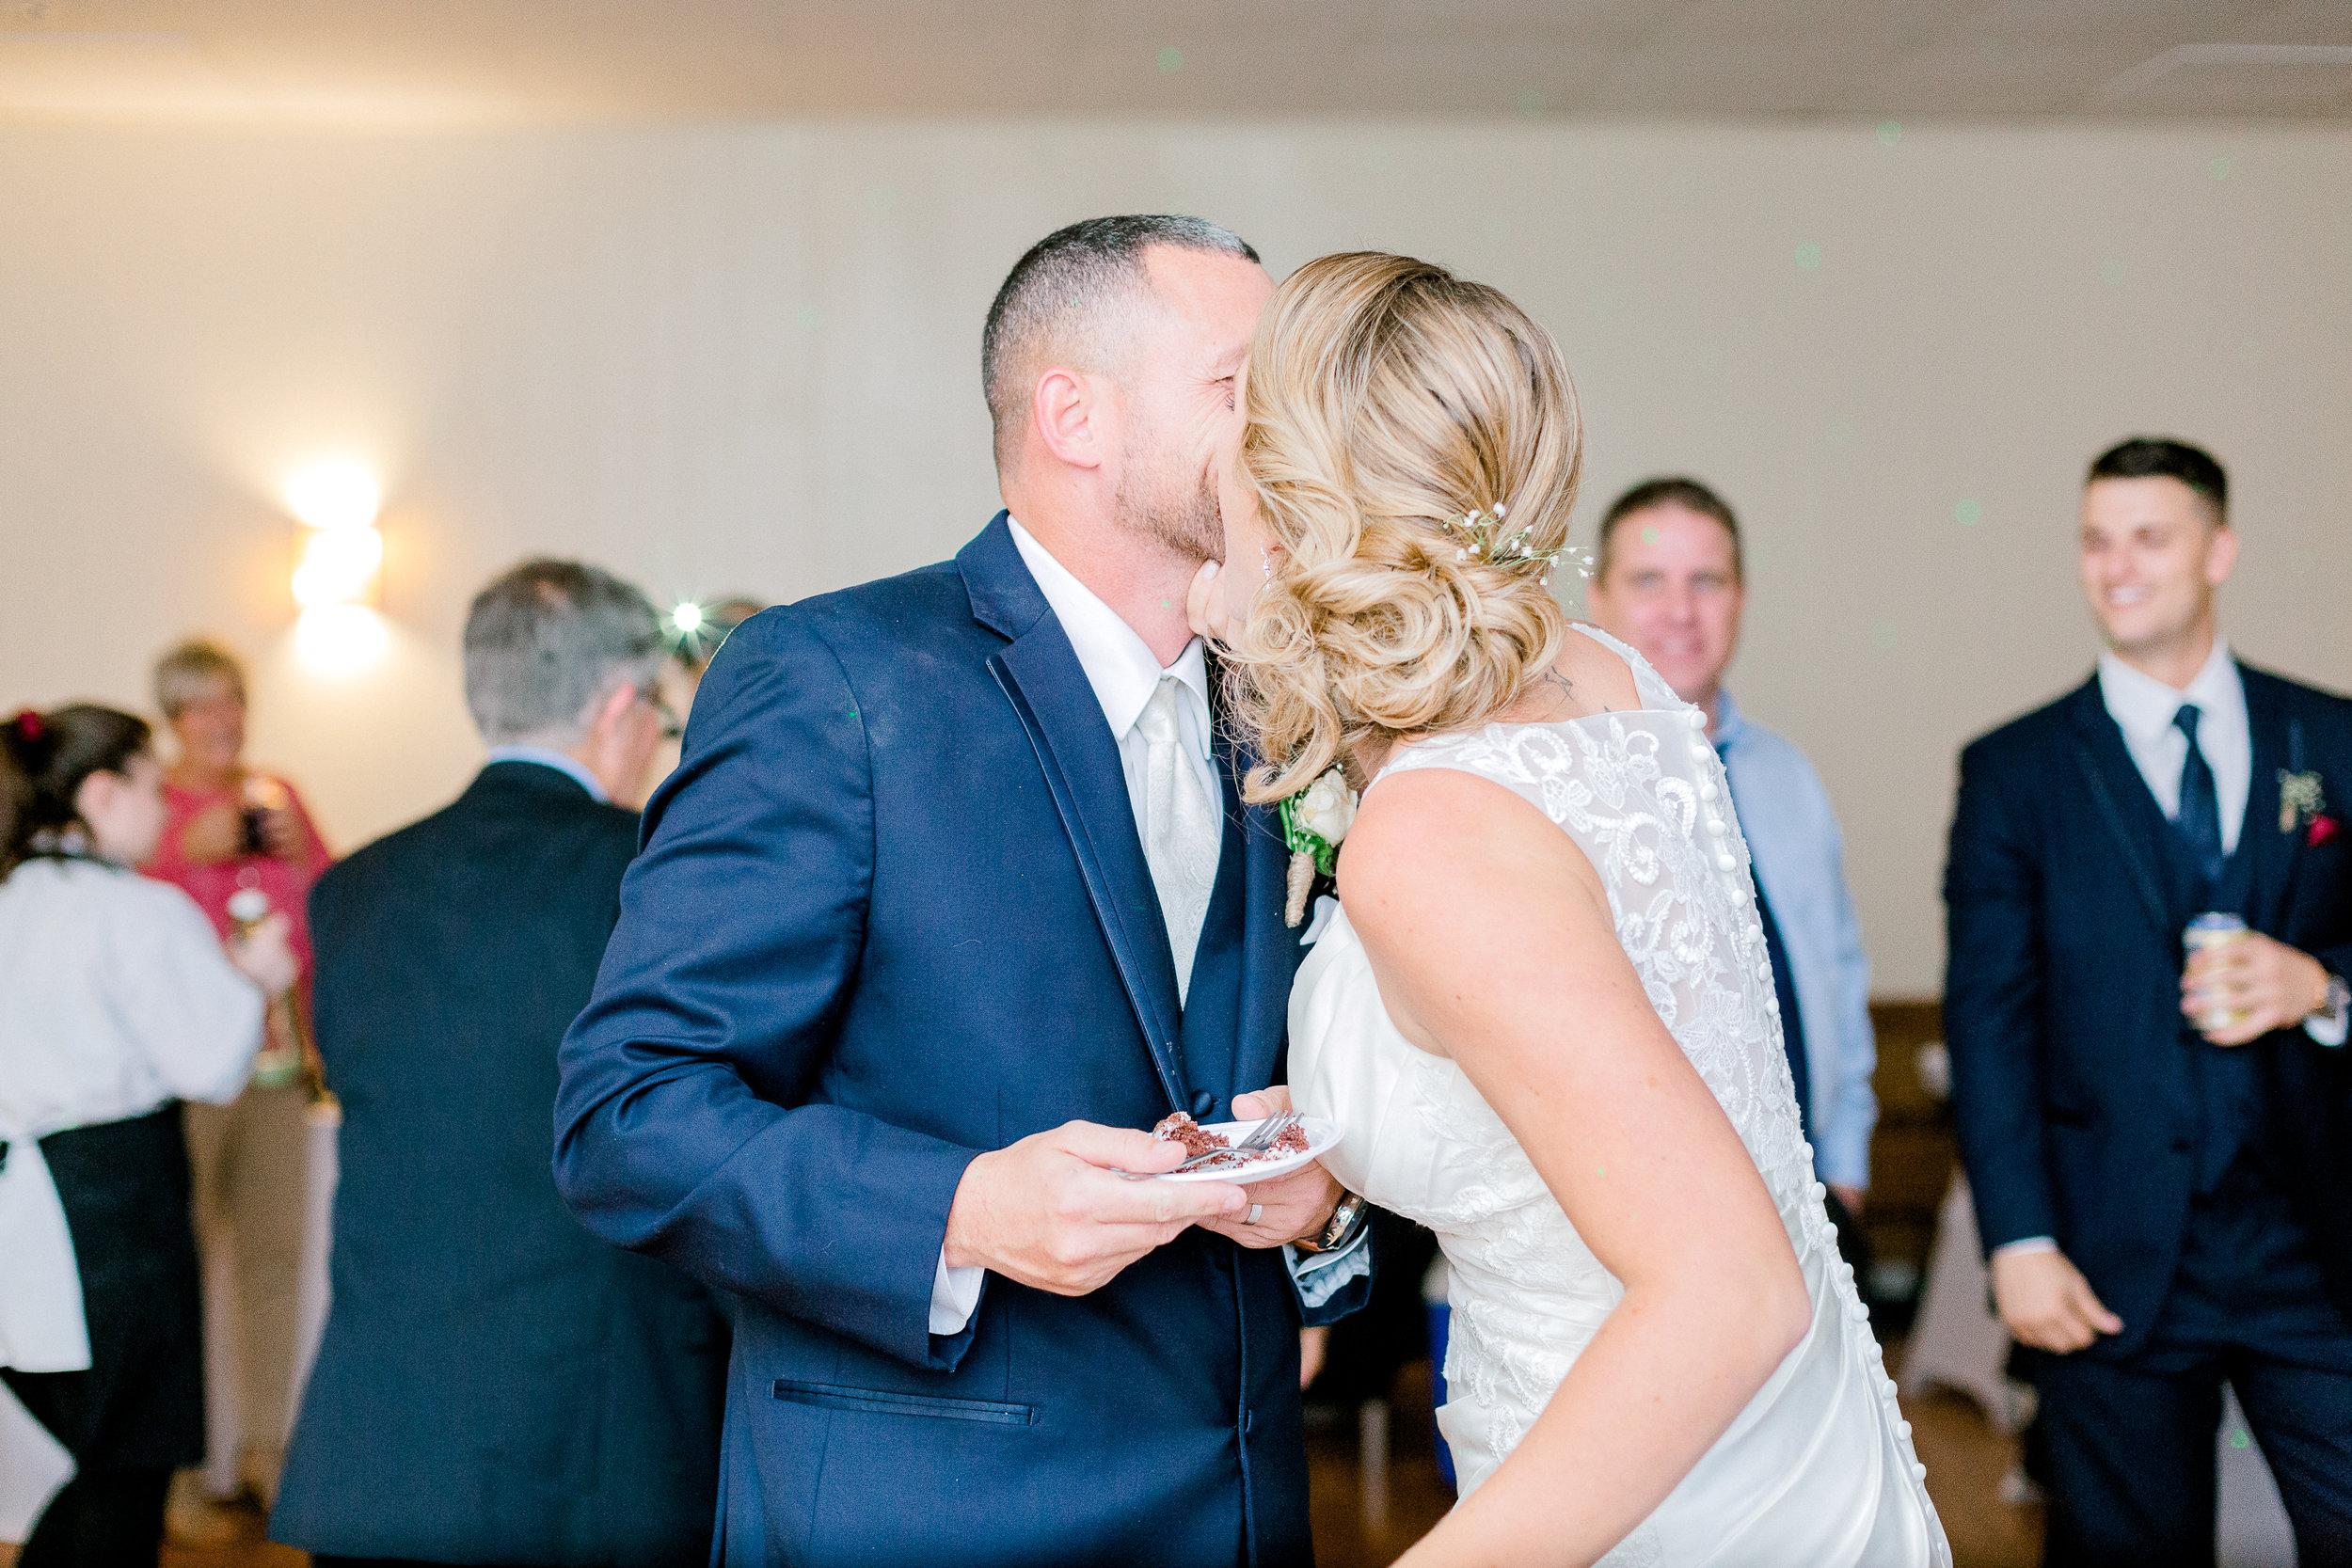 Pennsylvania October Fall Lehigh Valley wedding and lifestyle photographer Lytle Photo Co (155 of 167).jpg